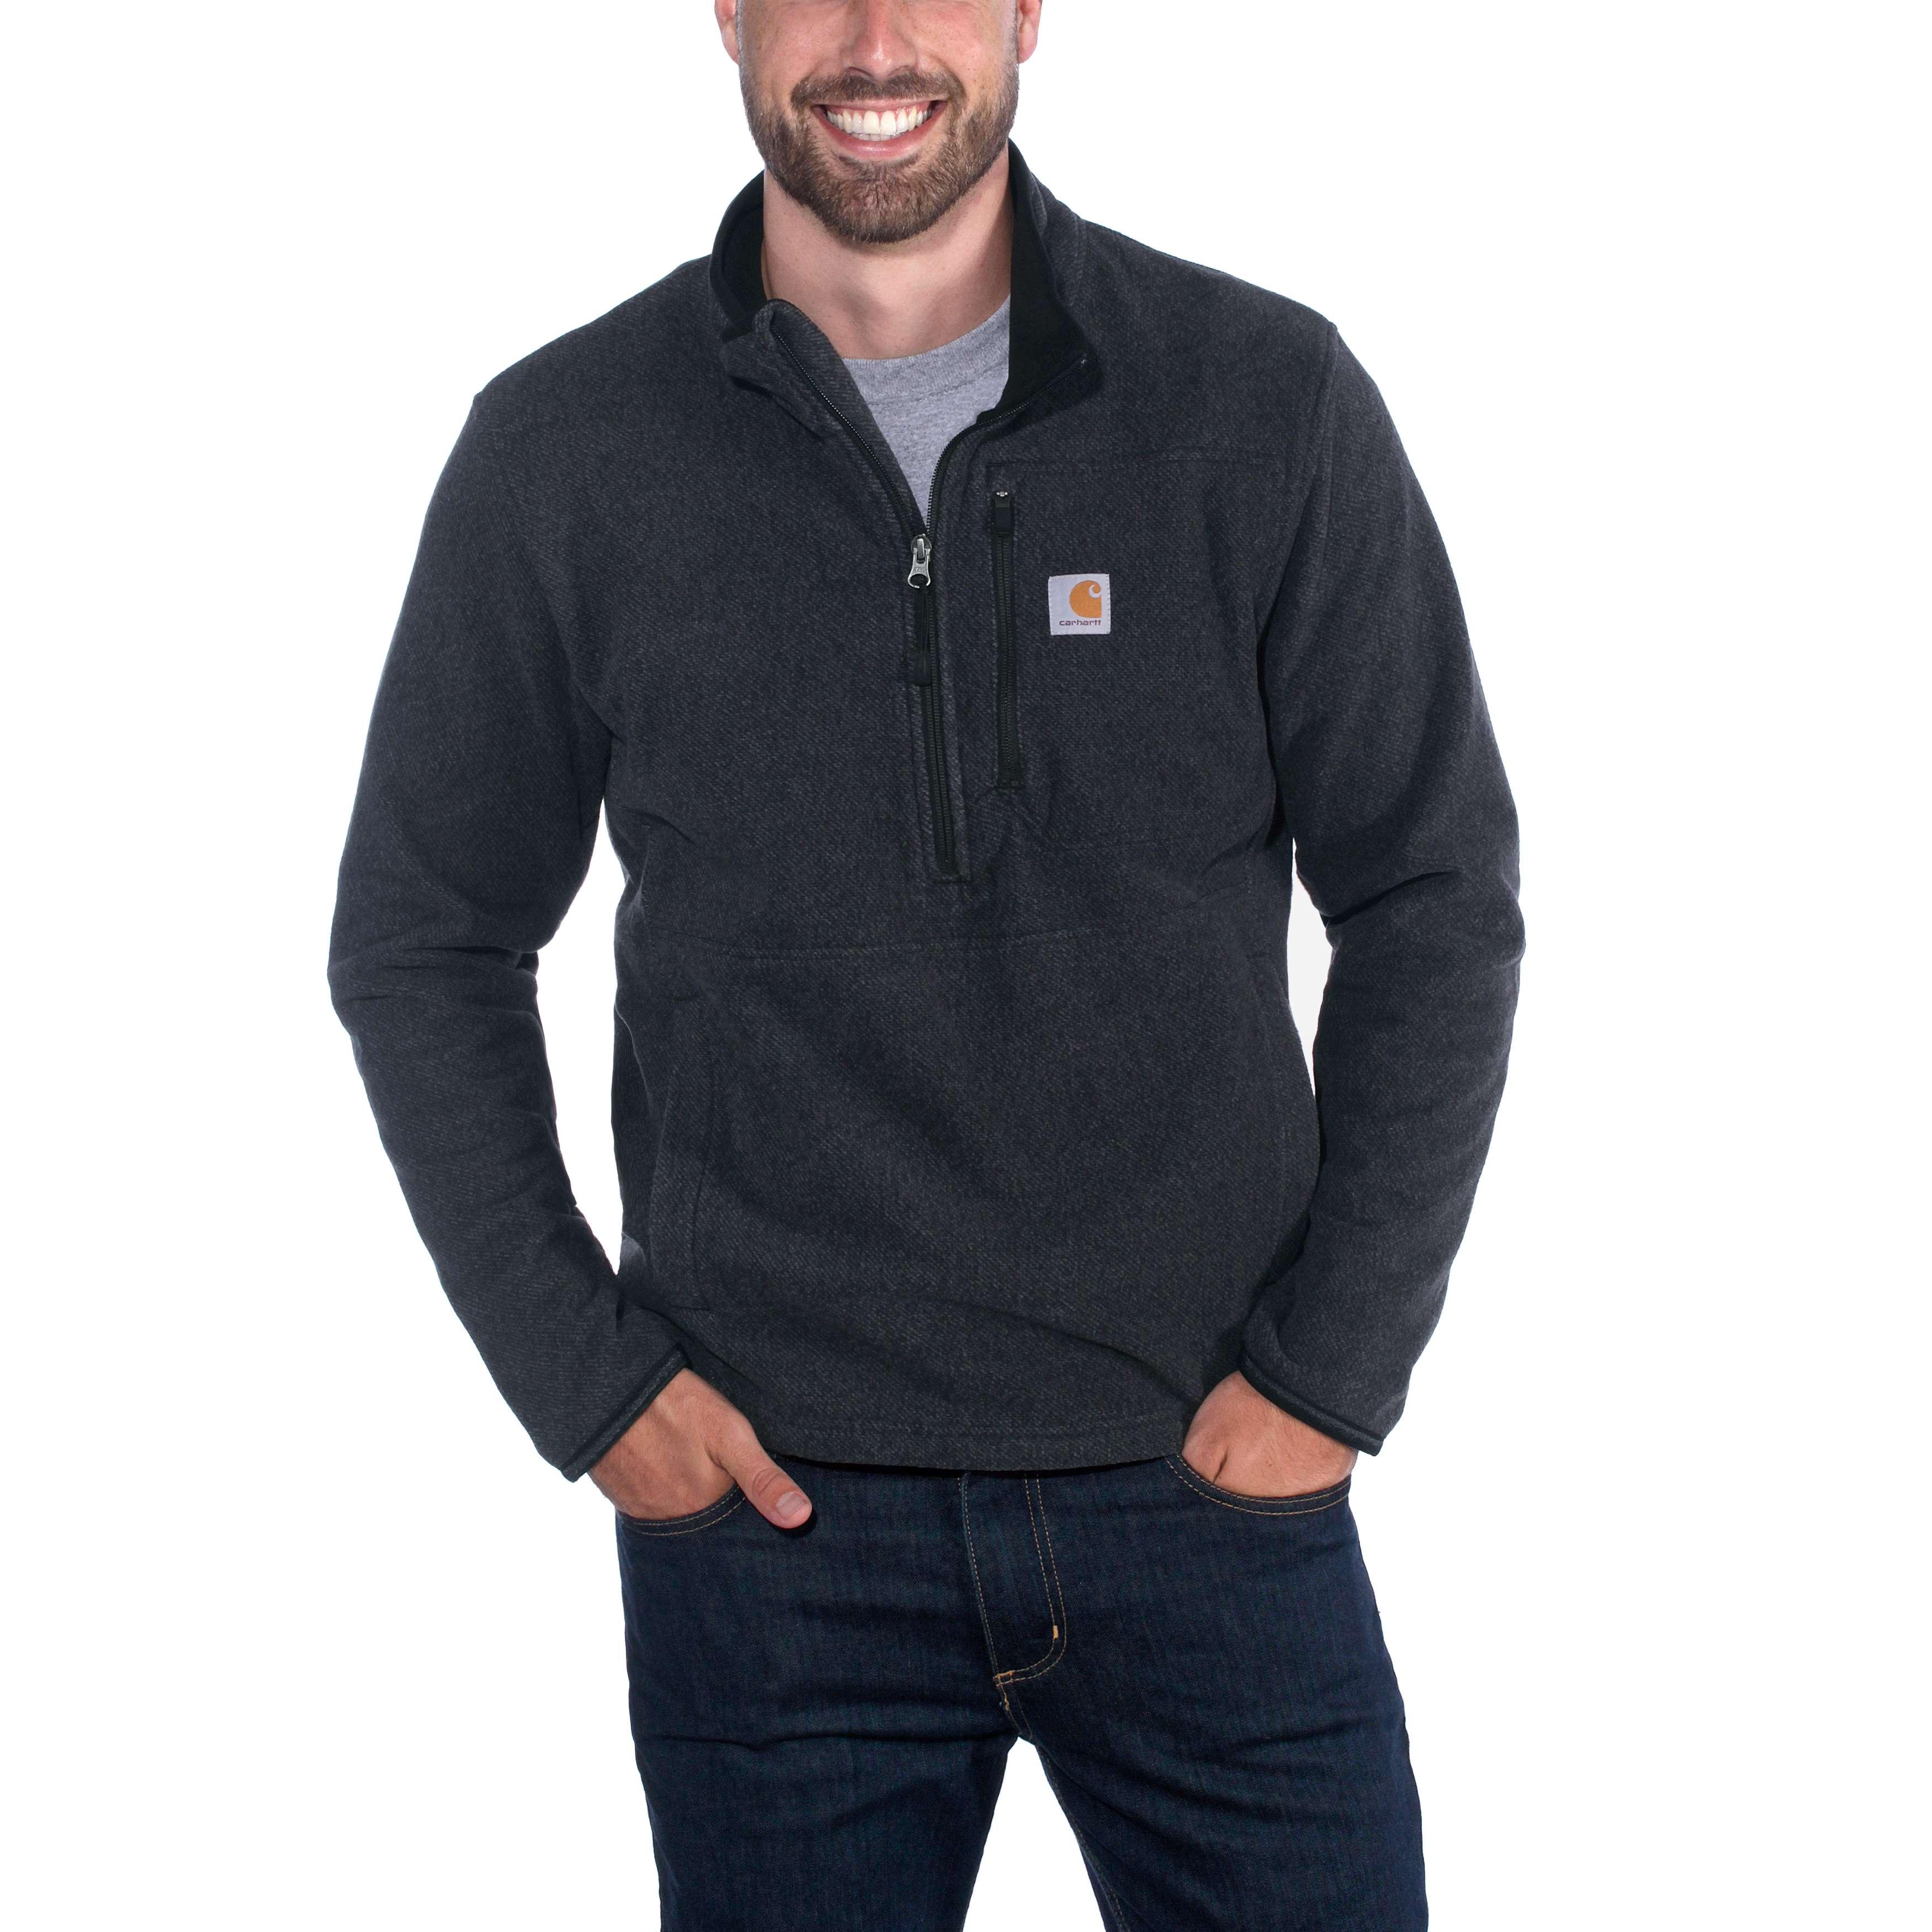 Carhartt Mens Dalton Full Zip Fleece Sweatshirt